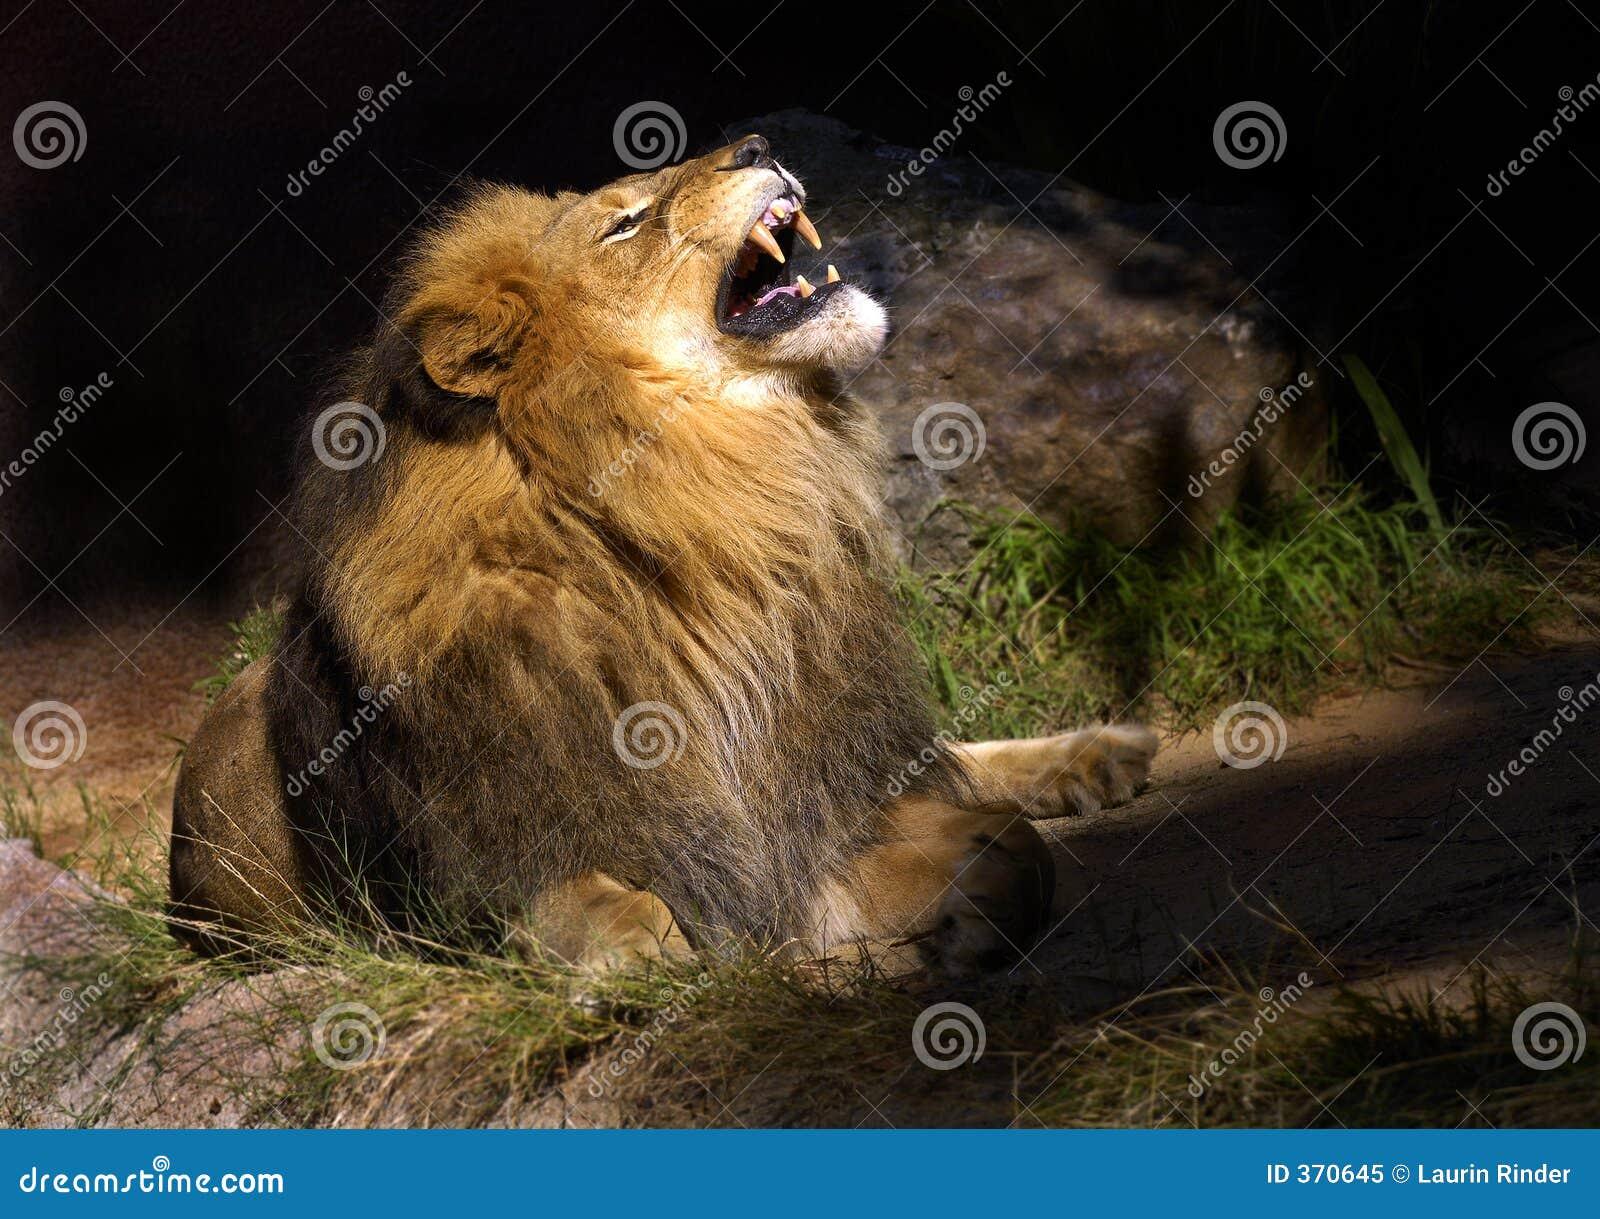 Tokig lion